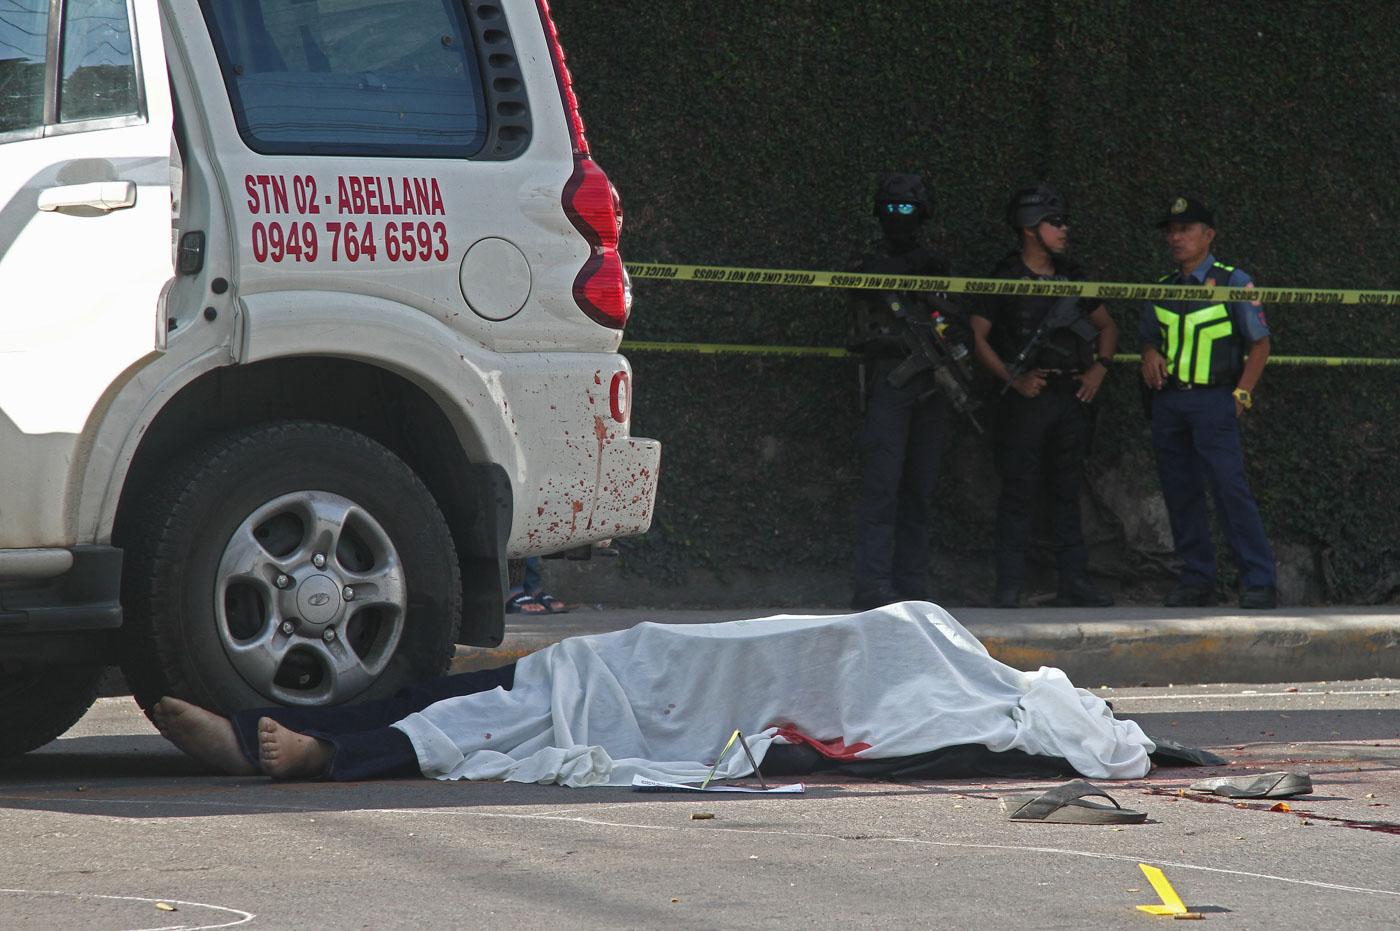 AMBUSHED. Clarin town mayor David Navarro of Misamis Occidental is shot dead by still unidentified gunmen in Cebu City on October 25, 2019. Photo by Gelo Litonjua